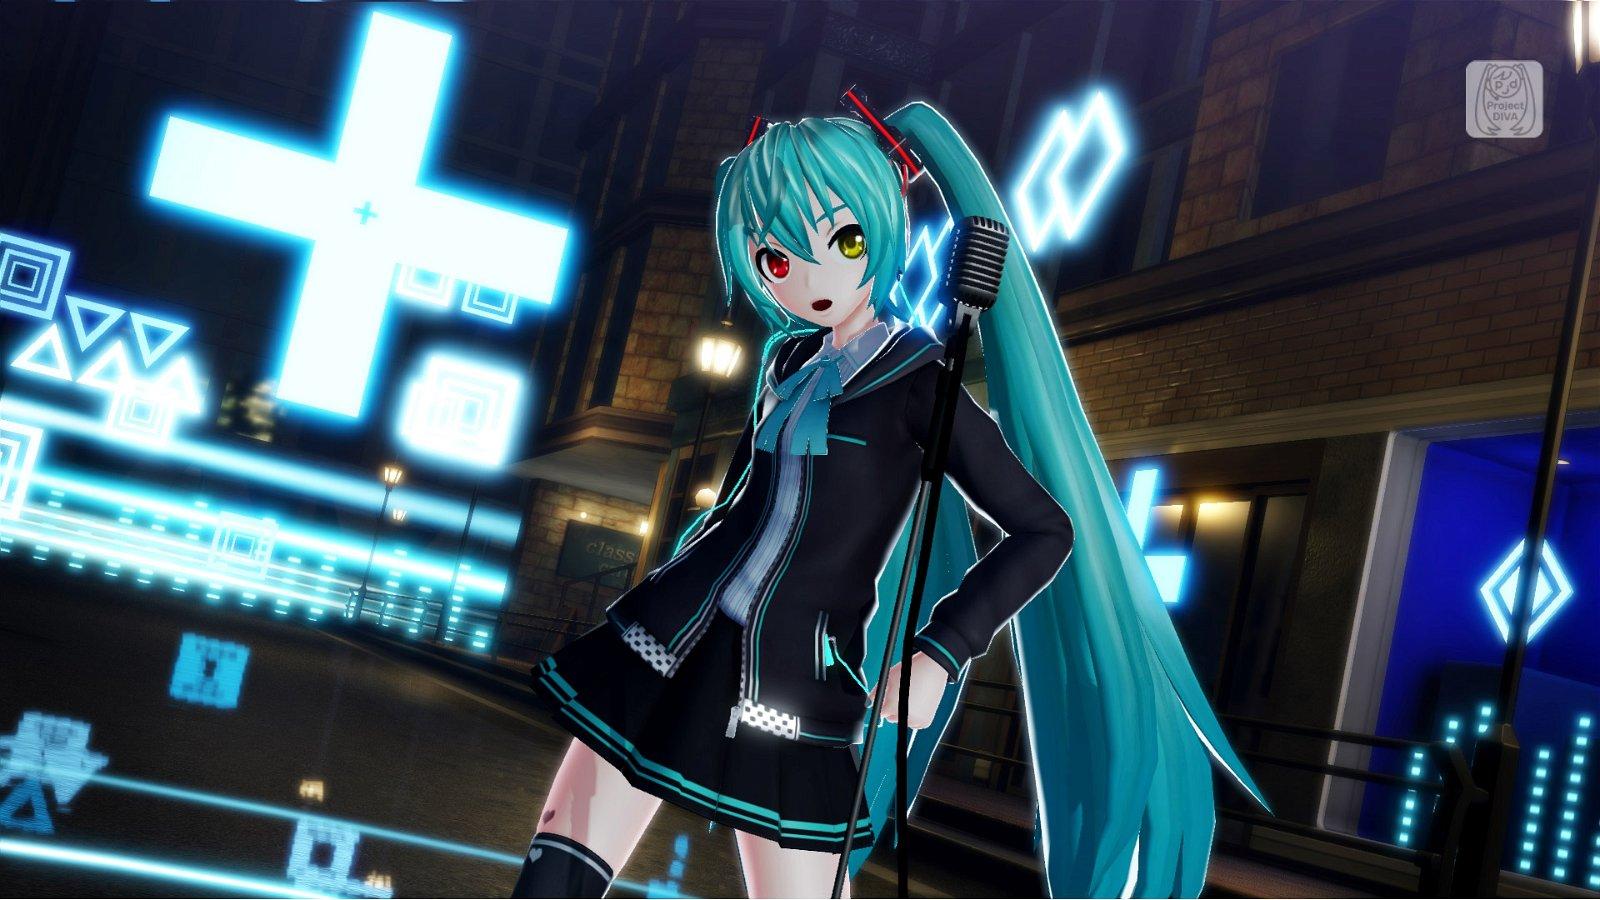 Hatsune Miku: VR Future Live To Launch Alongside Playstation VR 3